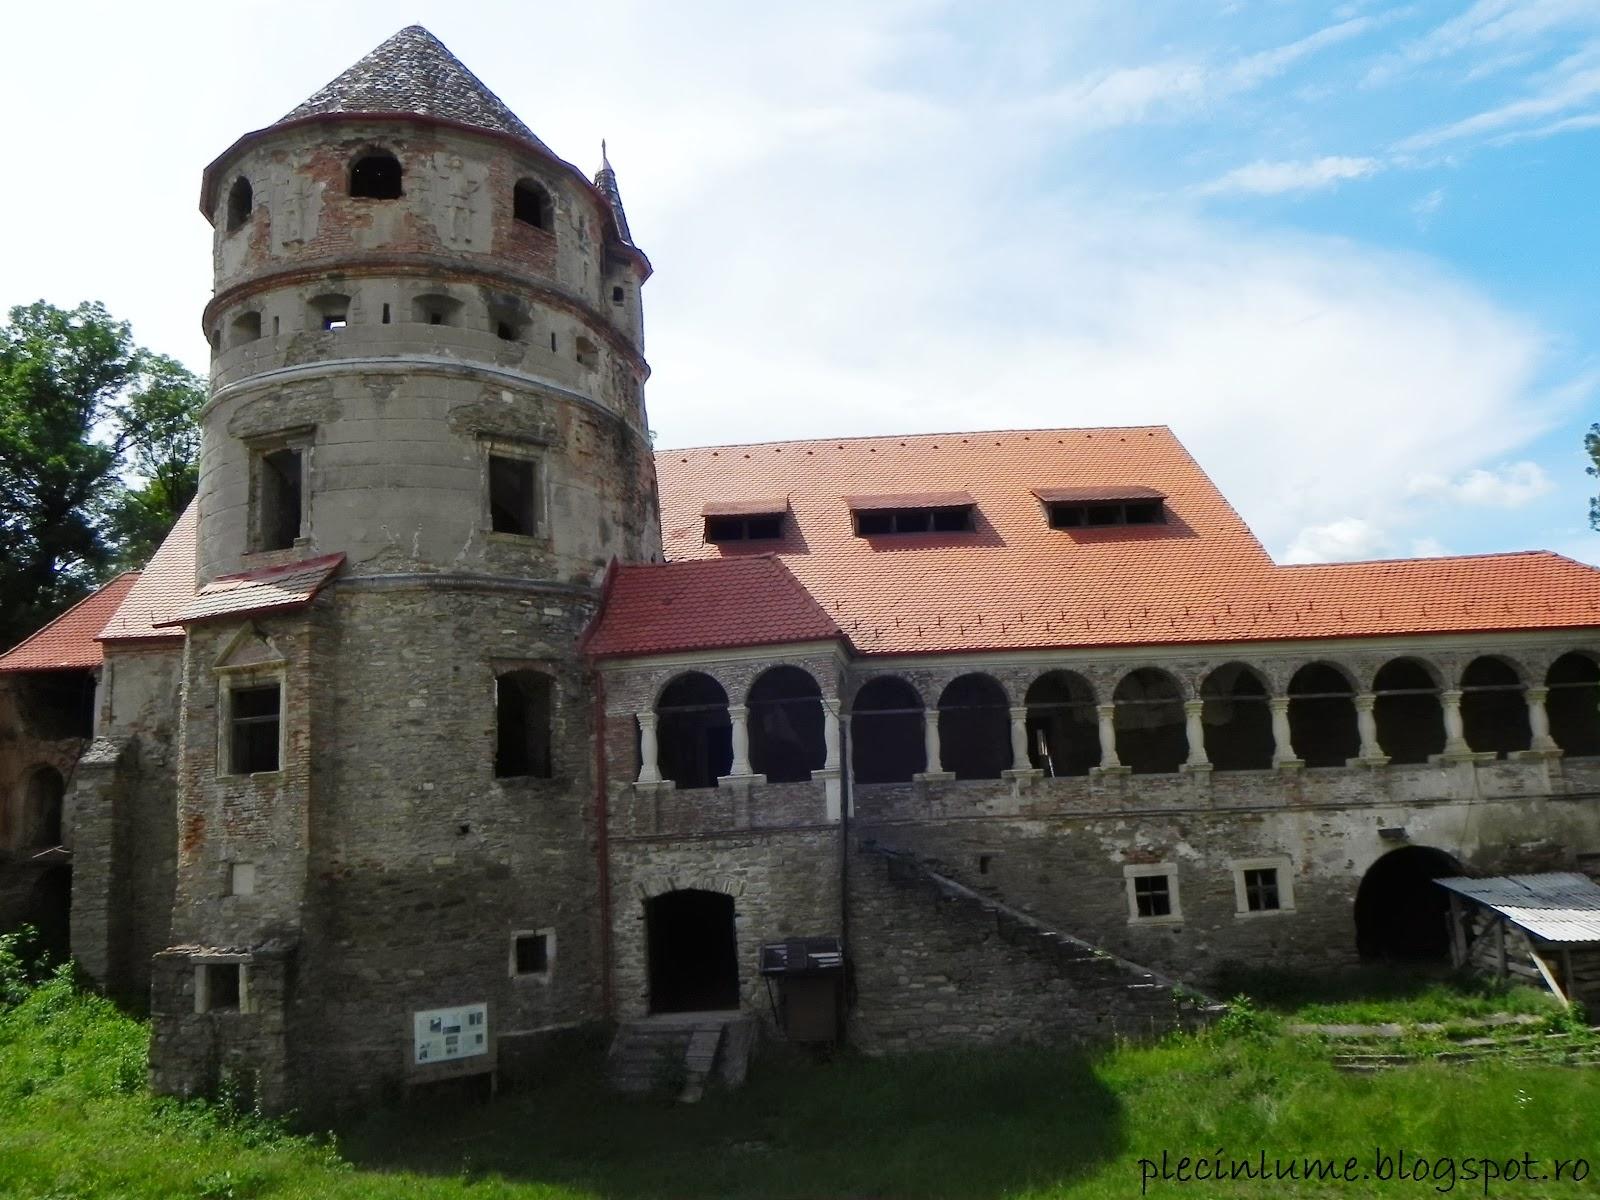 Cealalta aripa a castelului Bethlen